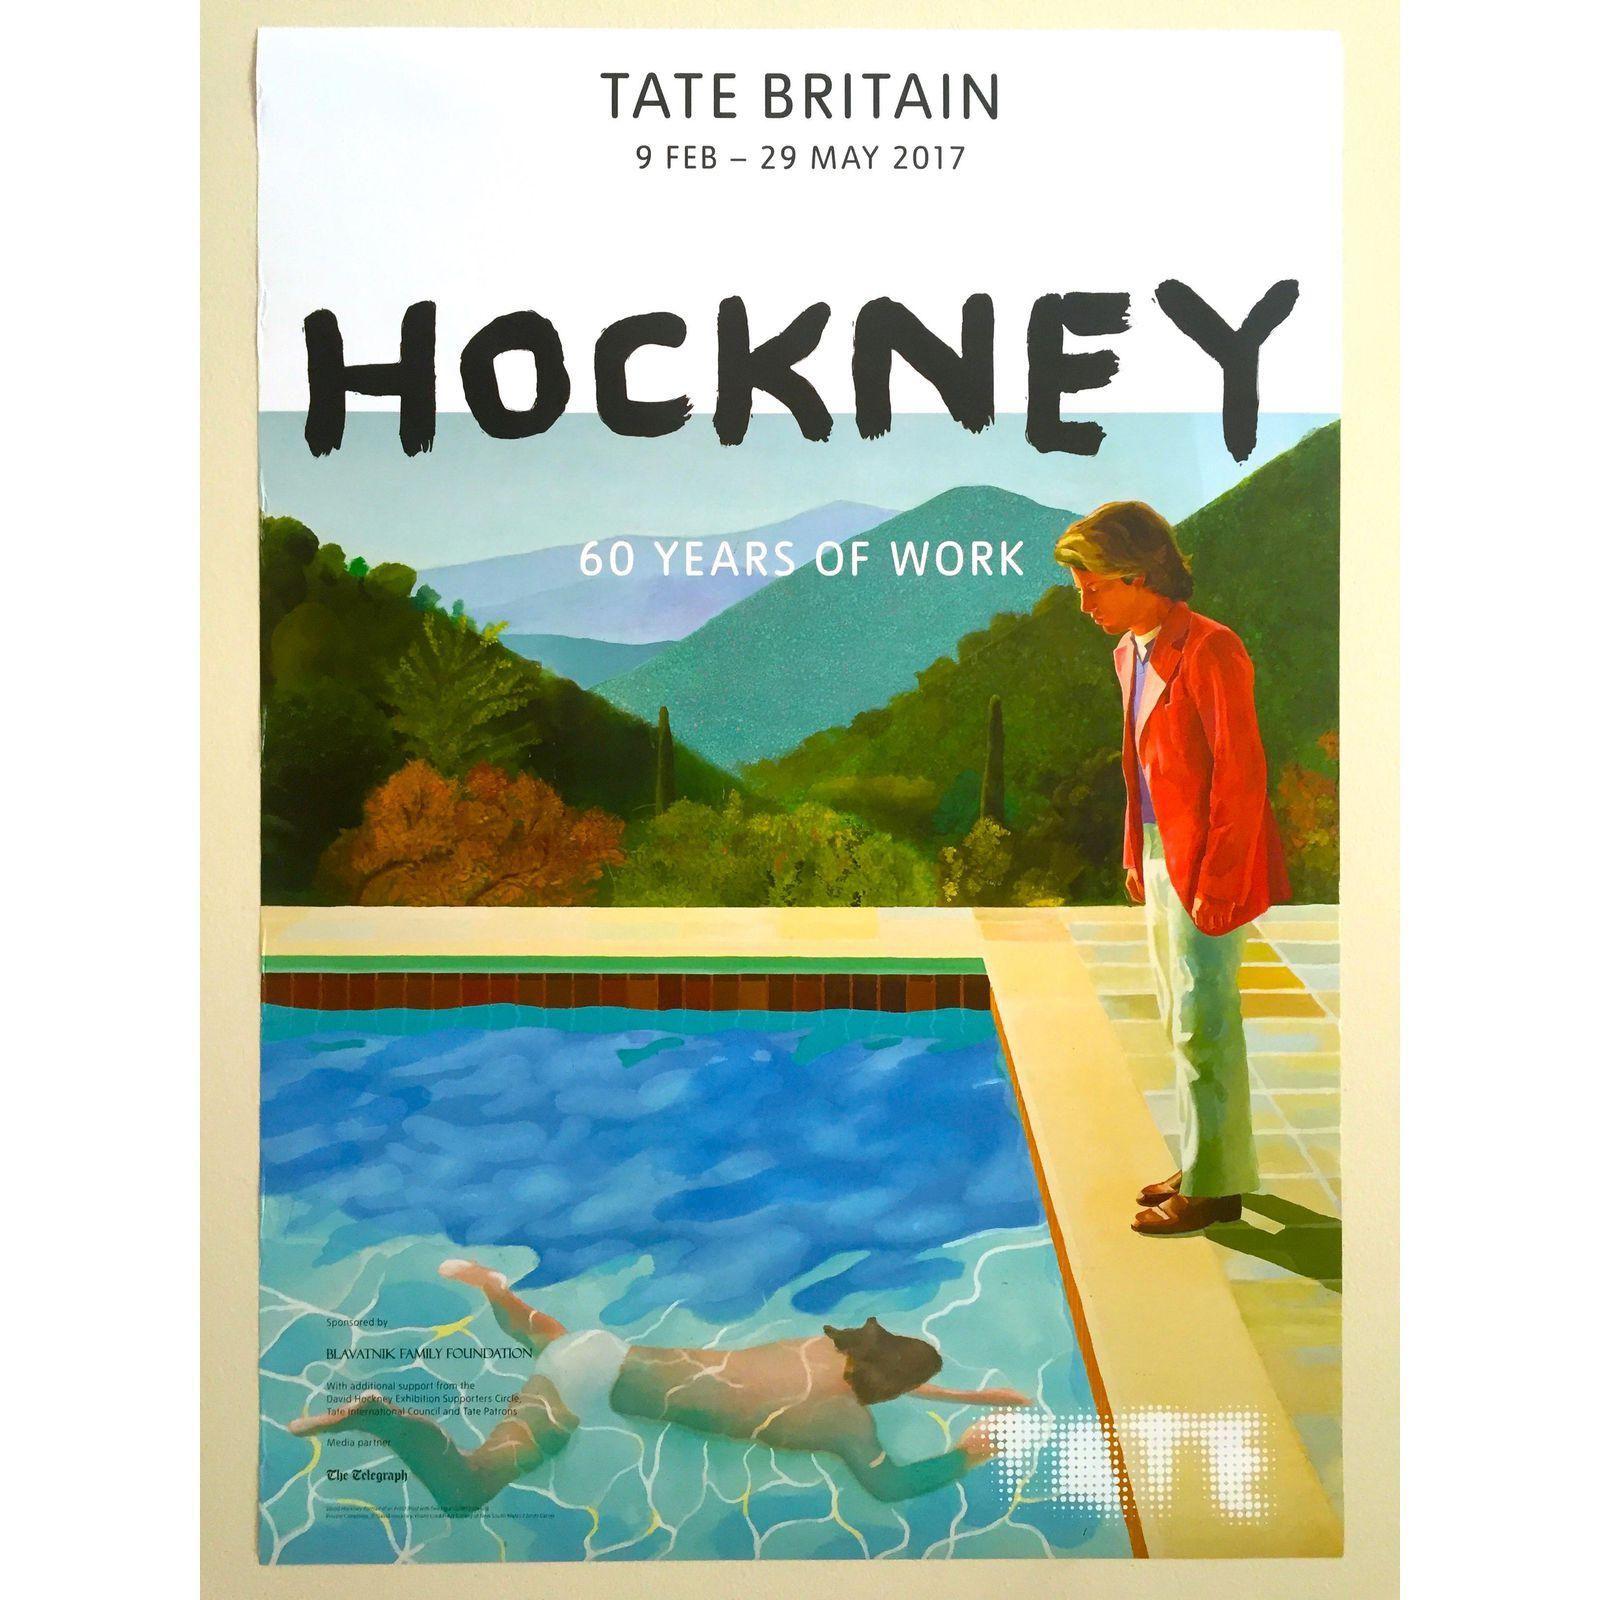 Tate Britain Vintage Posters